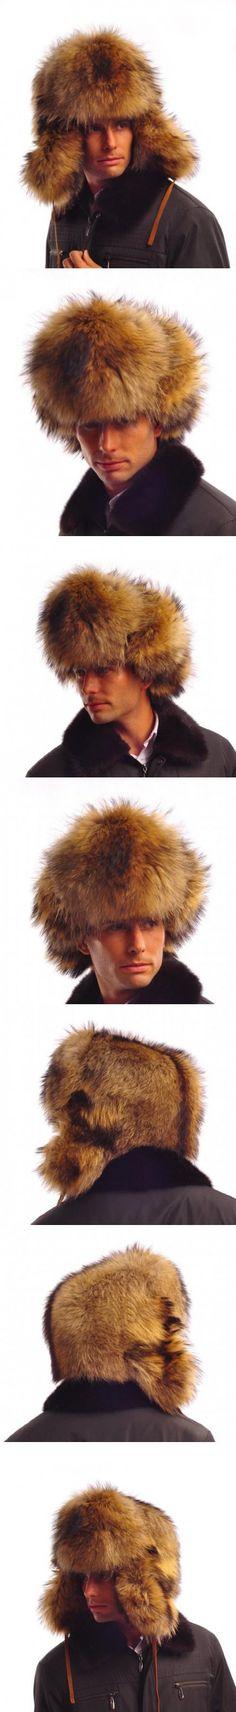 URSFUR Men's Raccoon Full Fur Russian Ushanka Trapper Hats Brown Z93